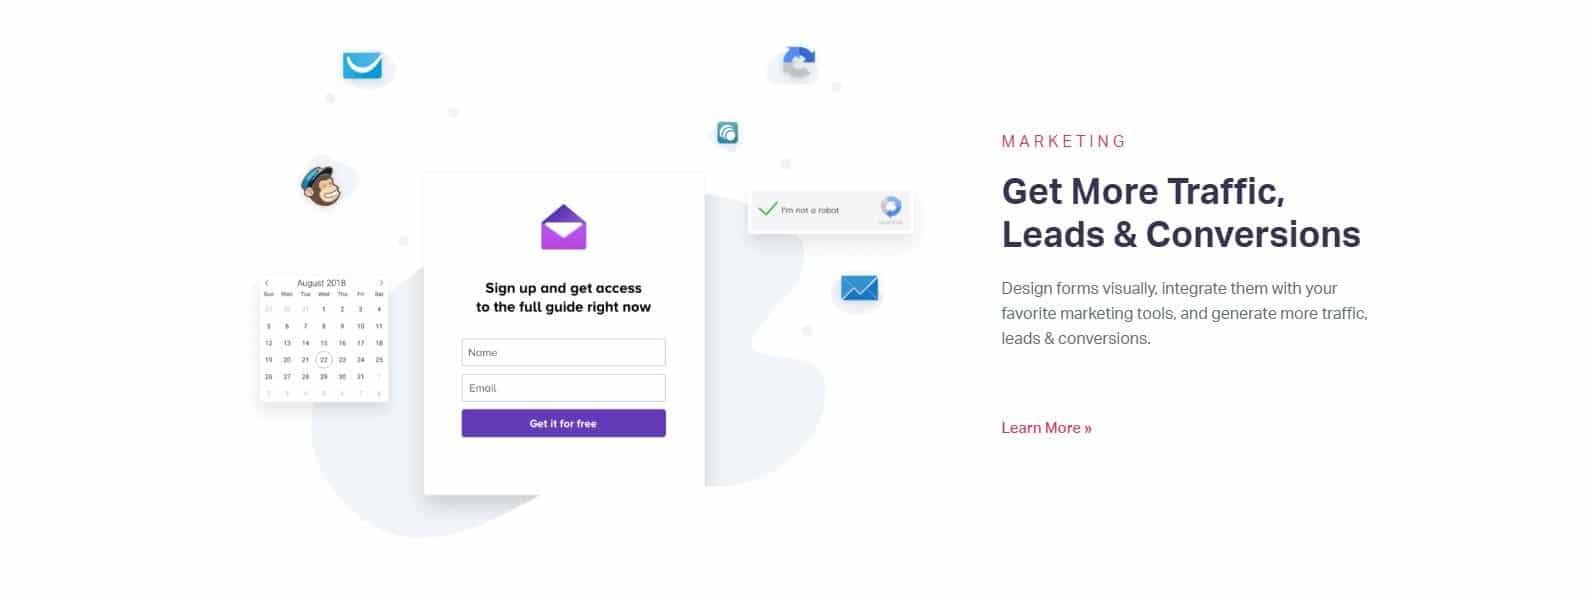 Elementor-pro-marketing